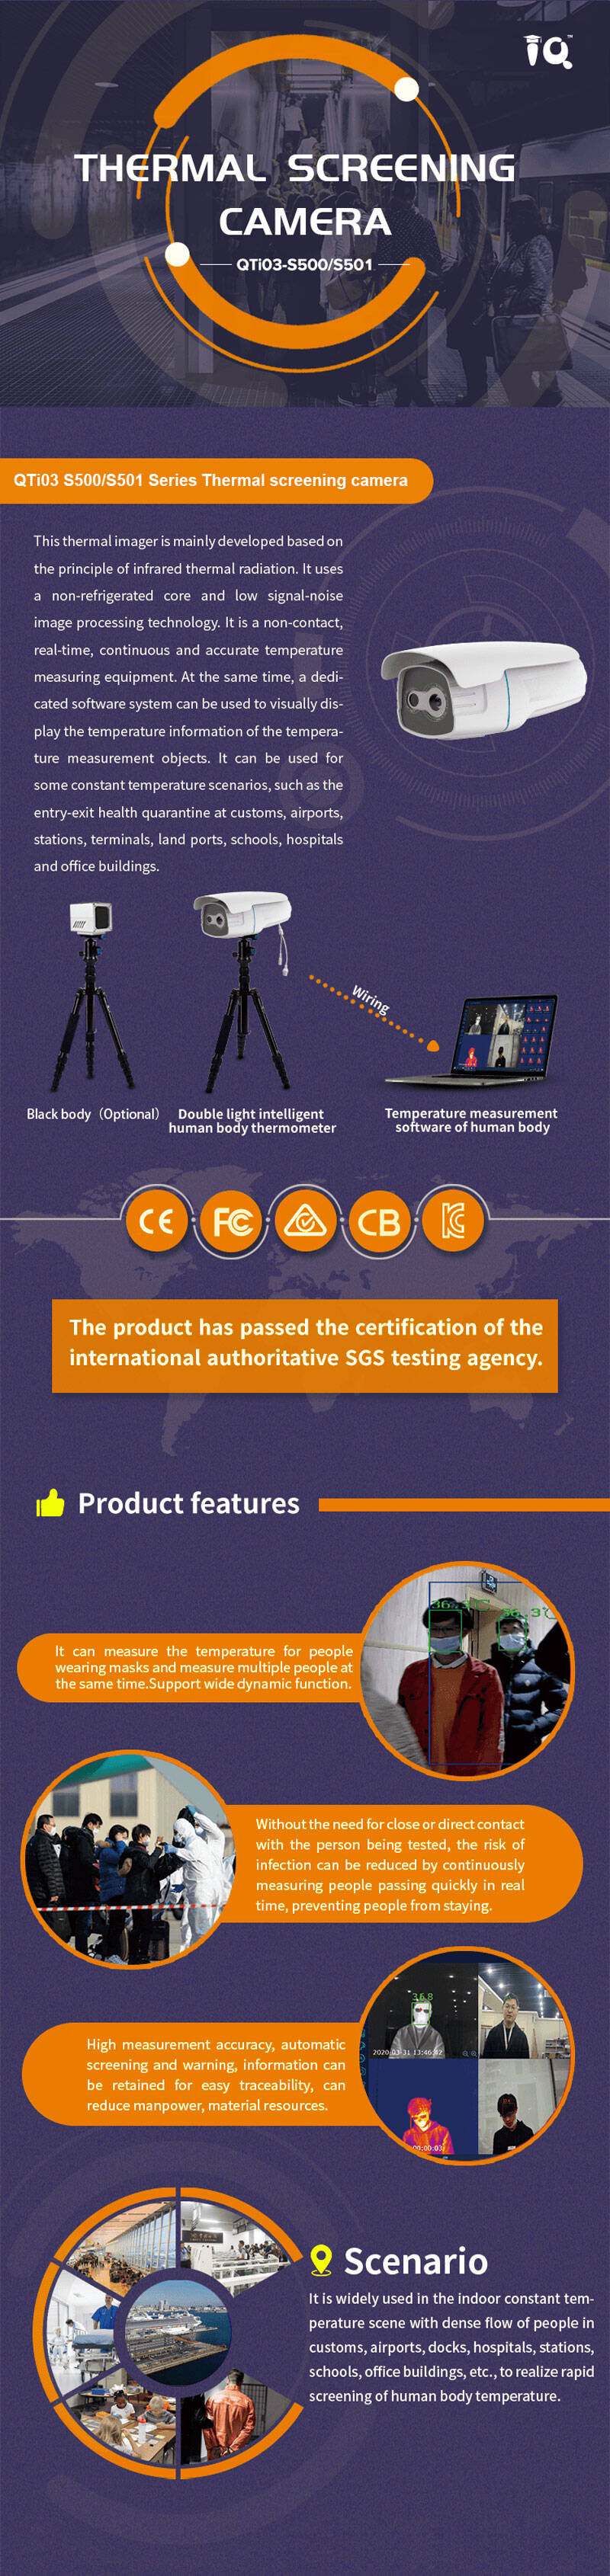 IQInfrared Thermal Scanning Camera